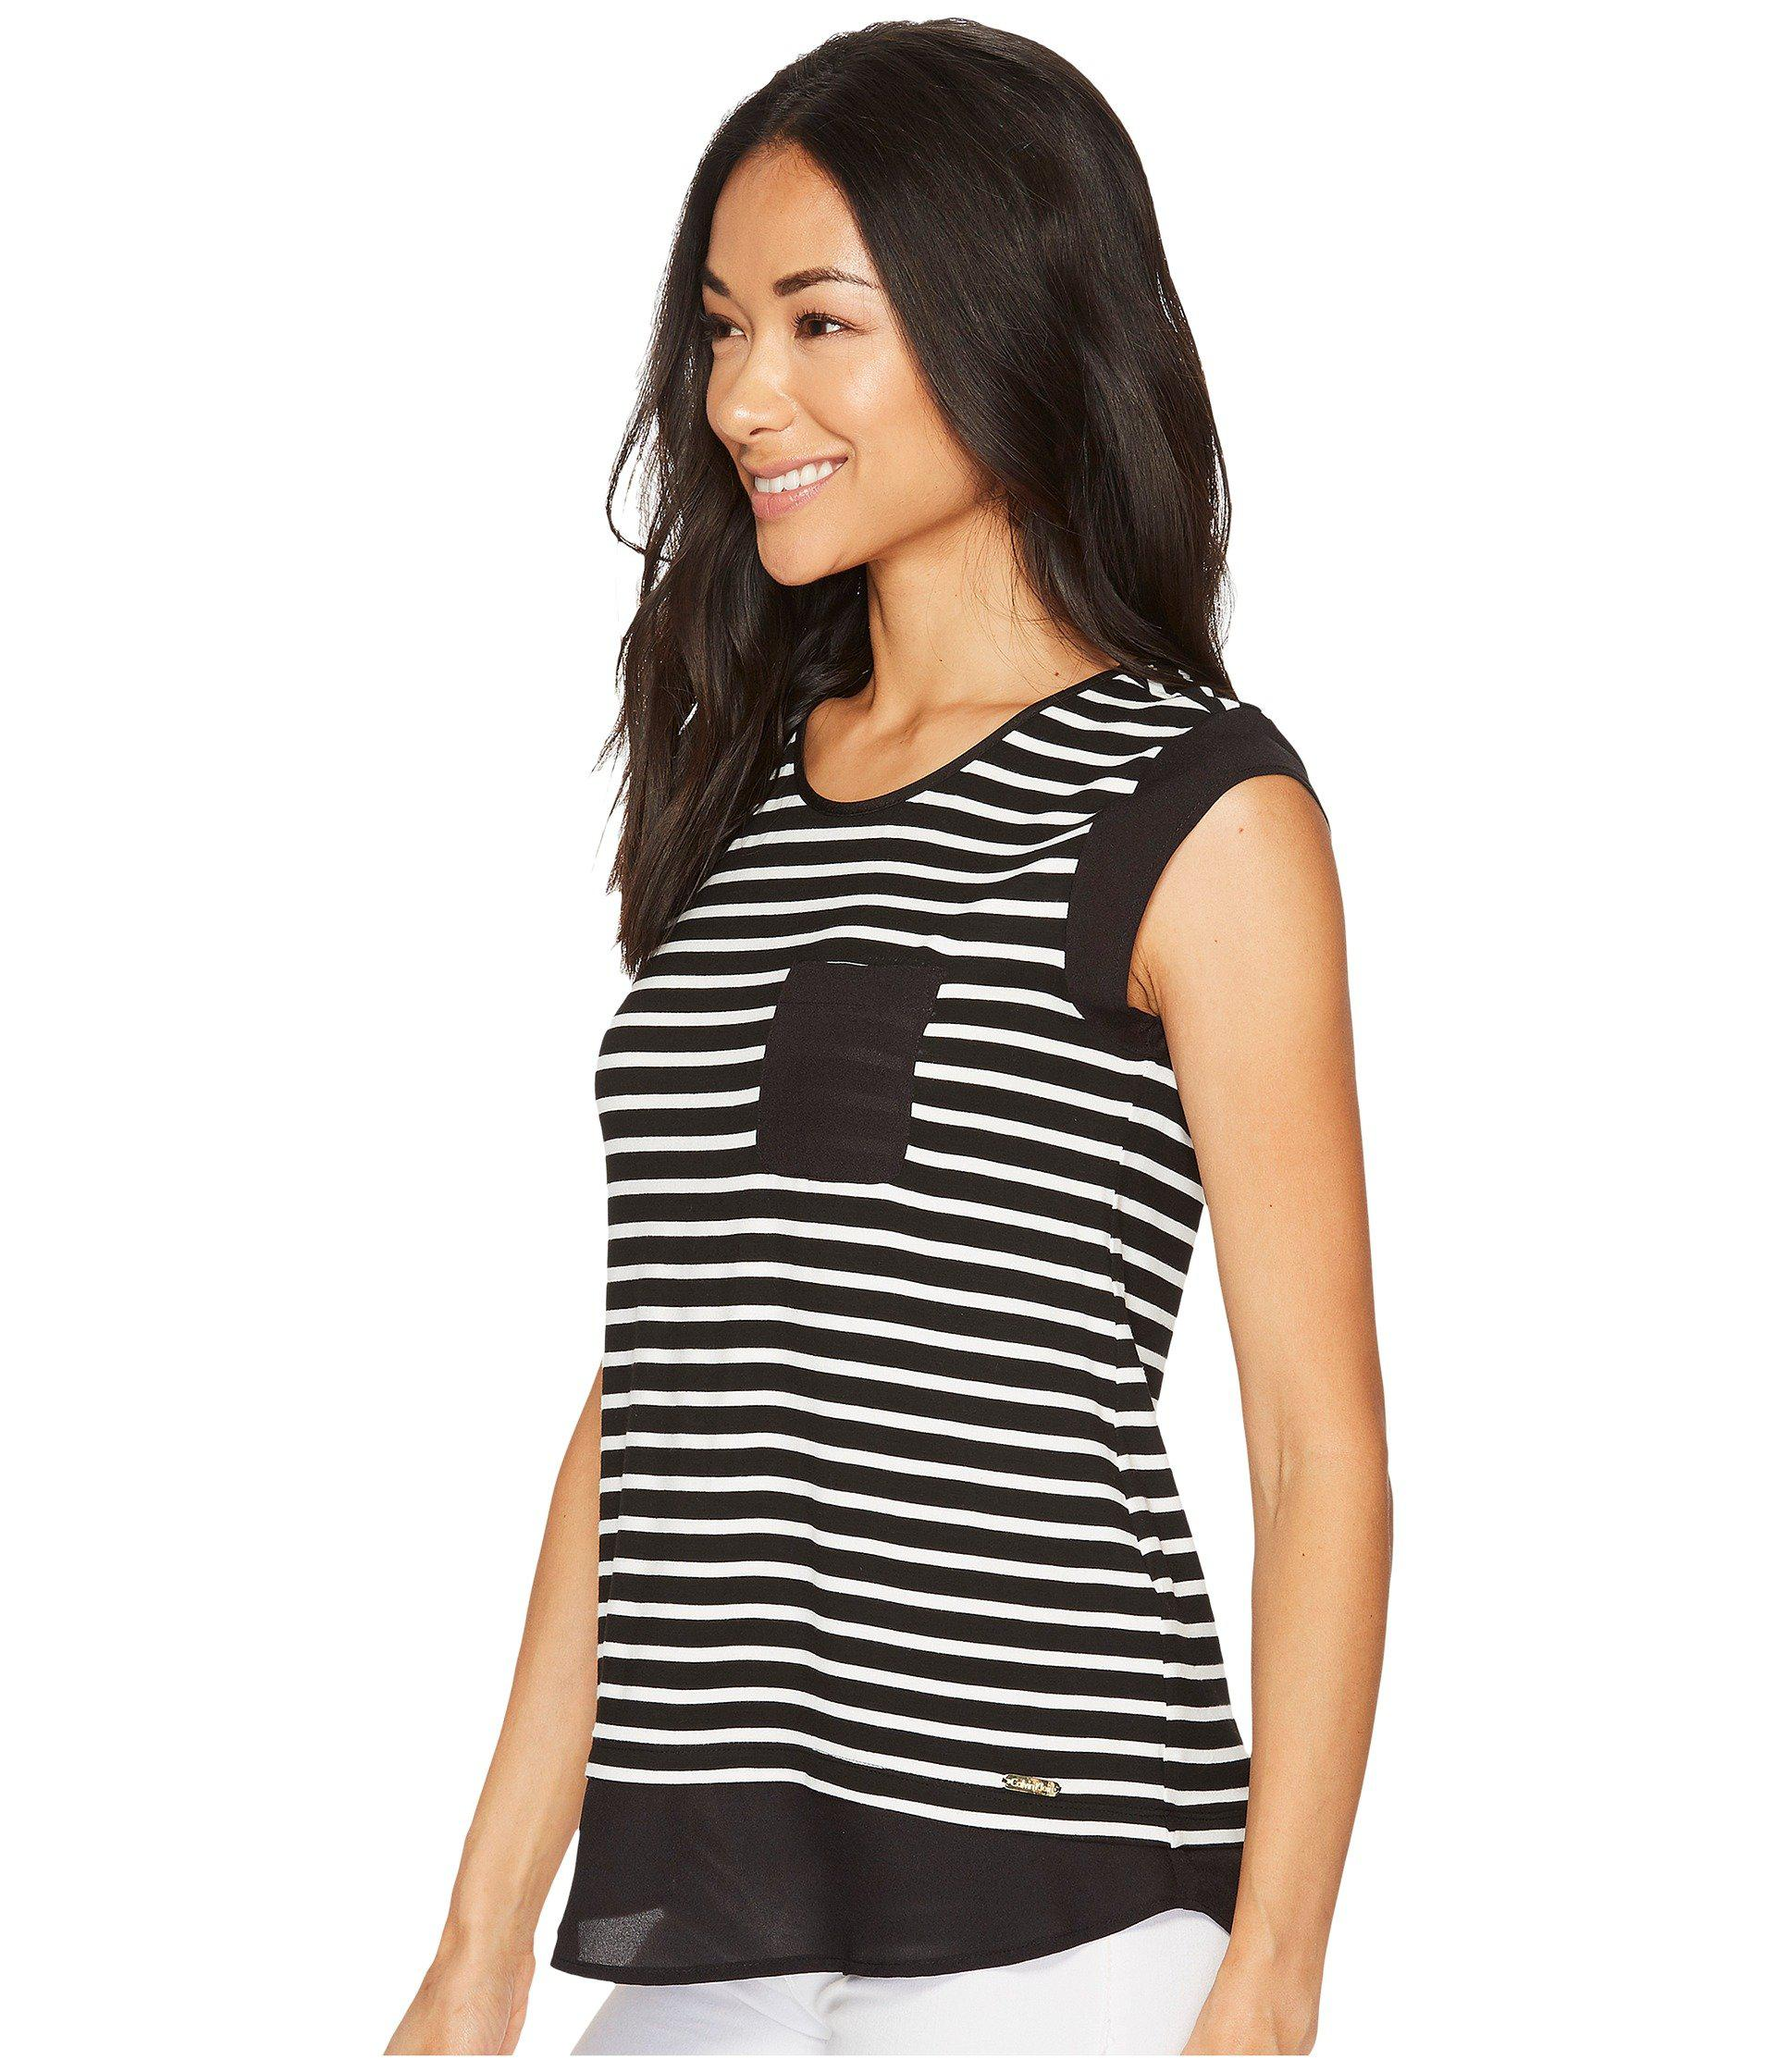 a30f10d8daef2 Lyst - Calvin Klein T-shirt With One-pocket (black birch) Women s T Shirt  in Black